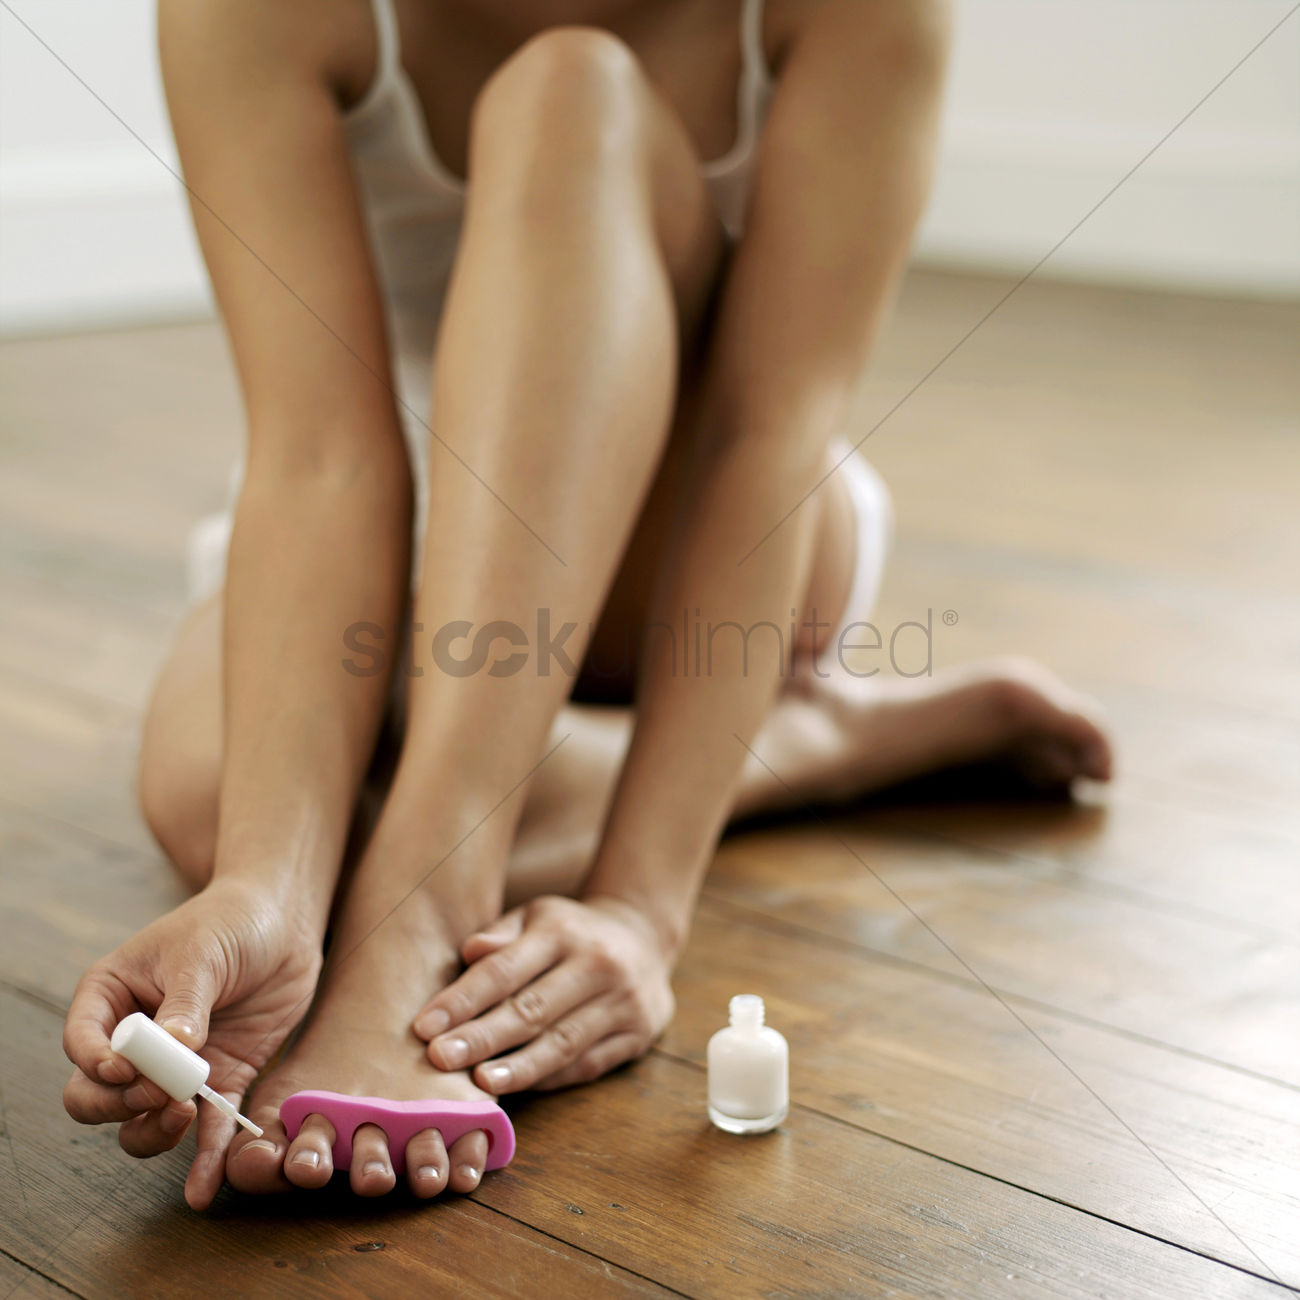 Woman Applying Nail Polish On Her Toe Nails Stock Photo 1699738